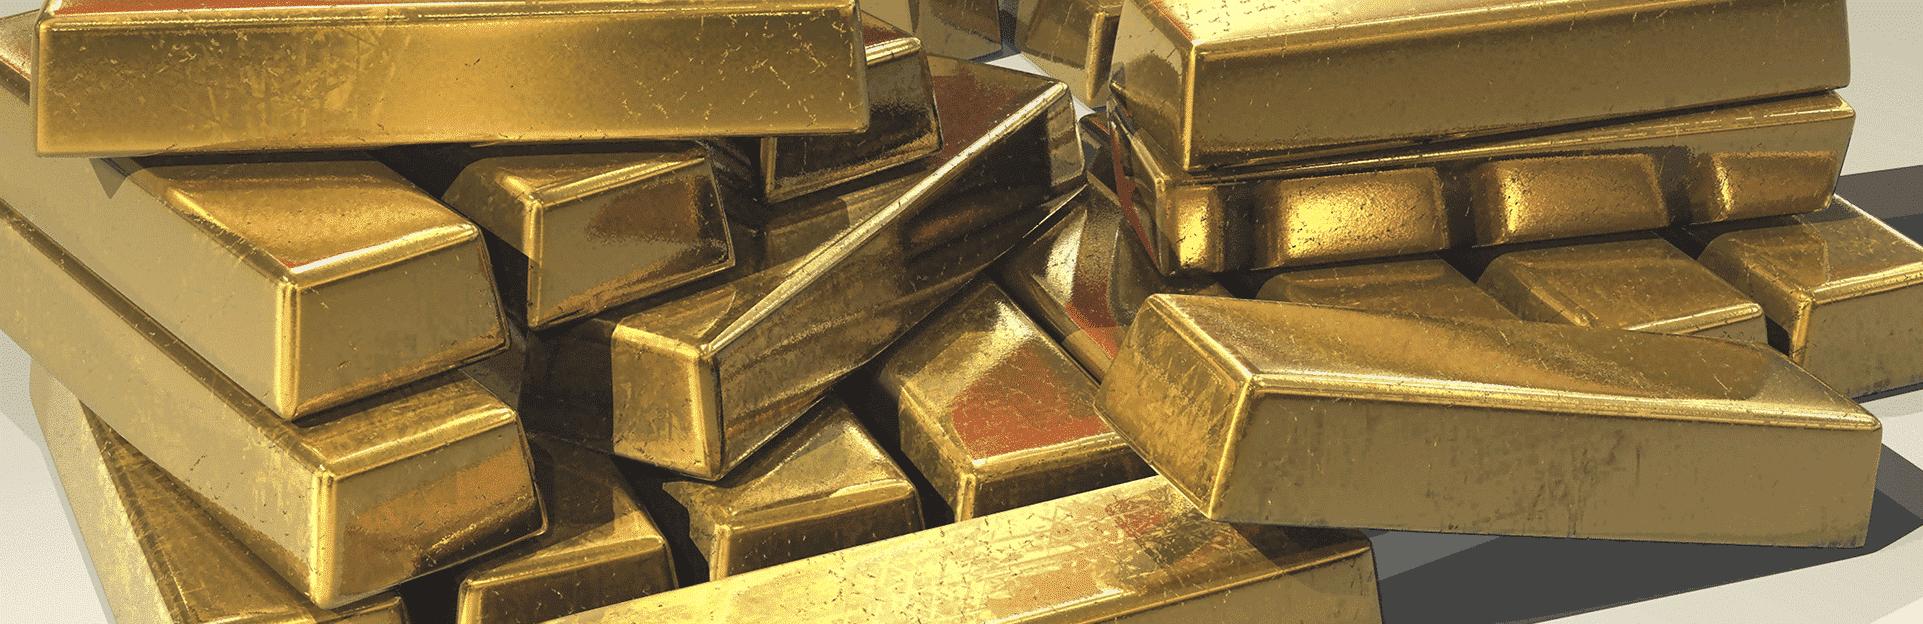 LTTR-Gold